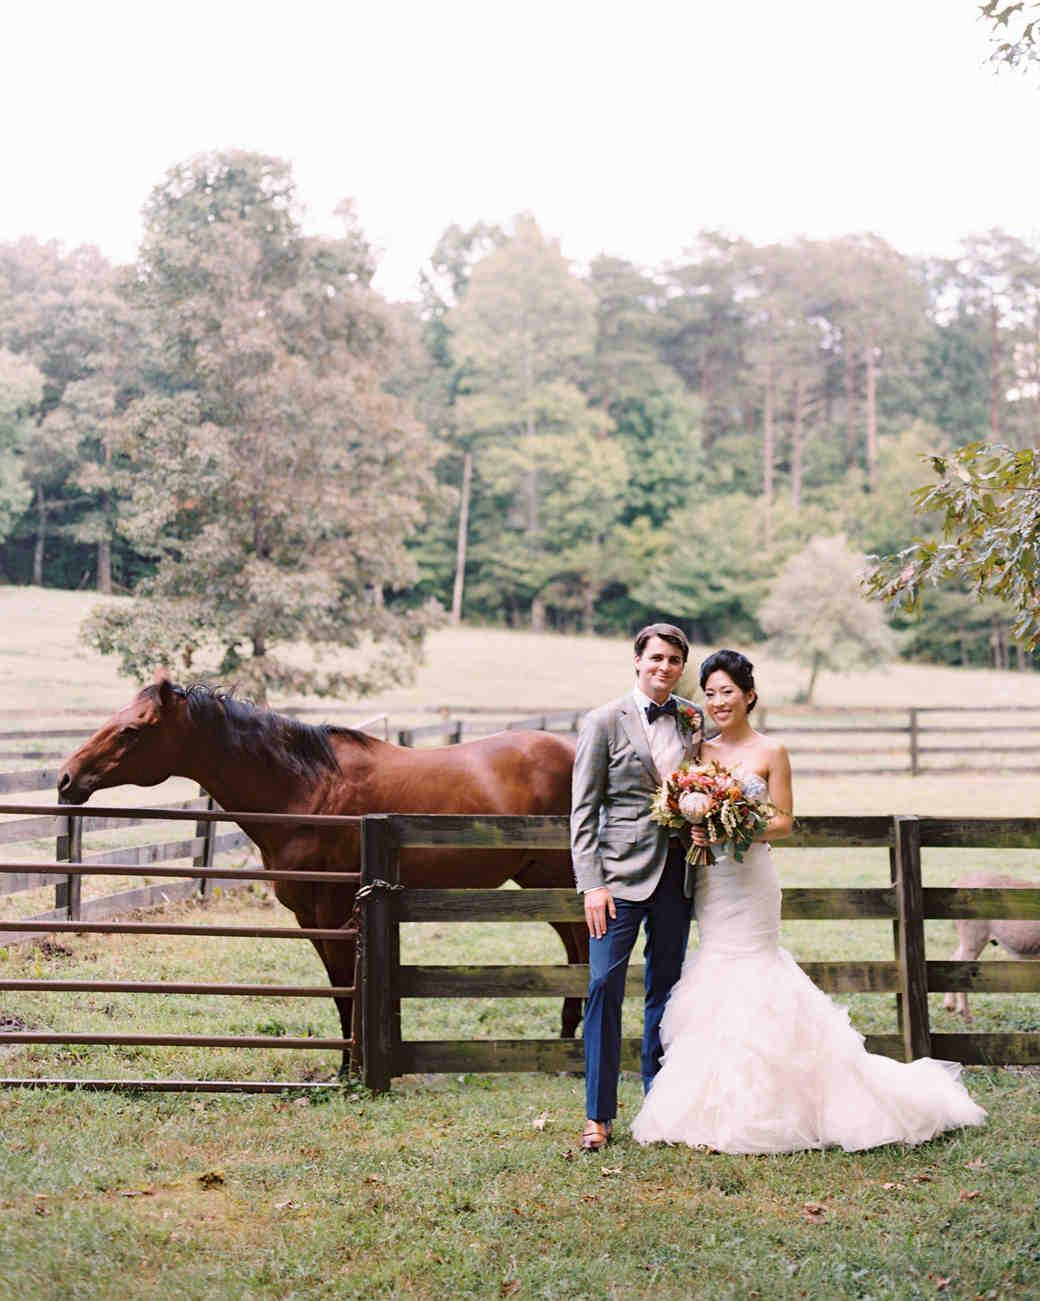 michelle-john-wedding-north-carolina-22-s111840-0215.jpg